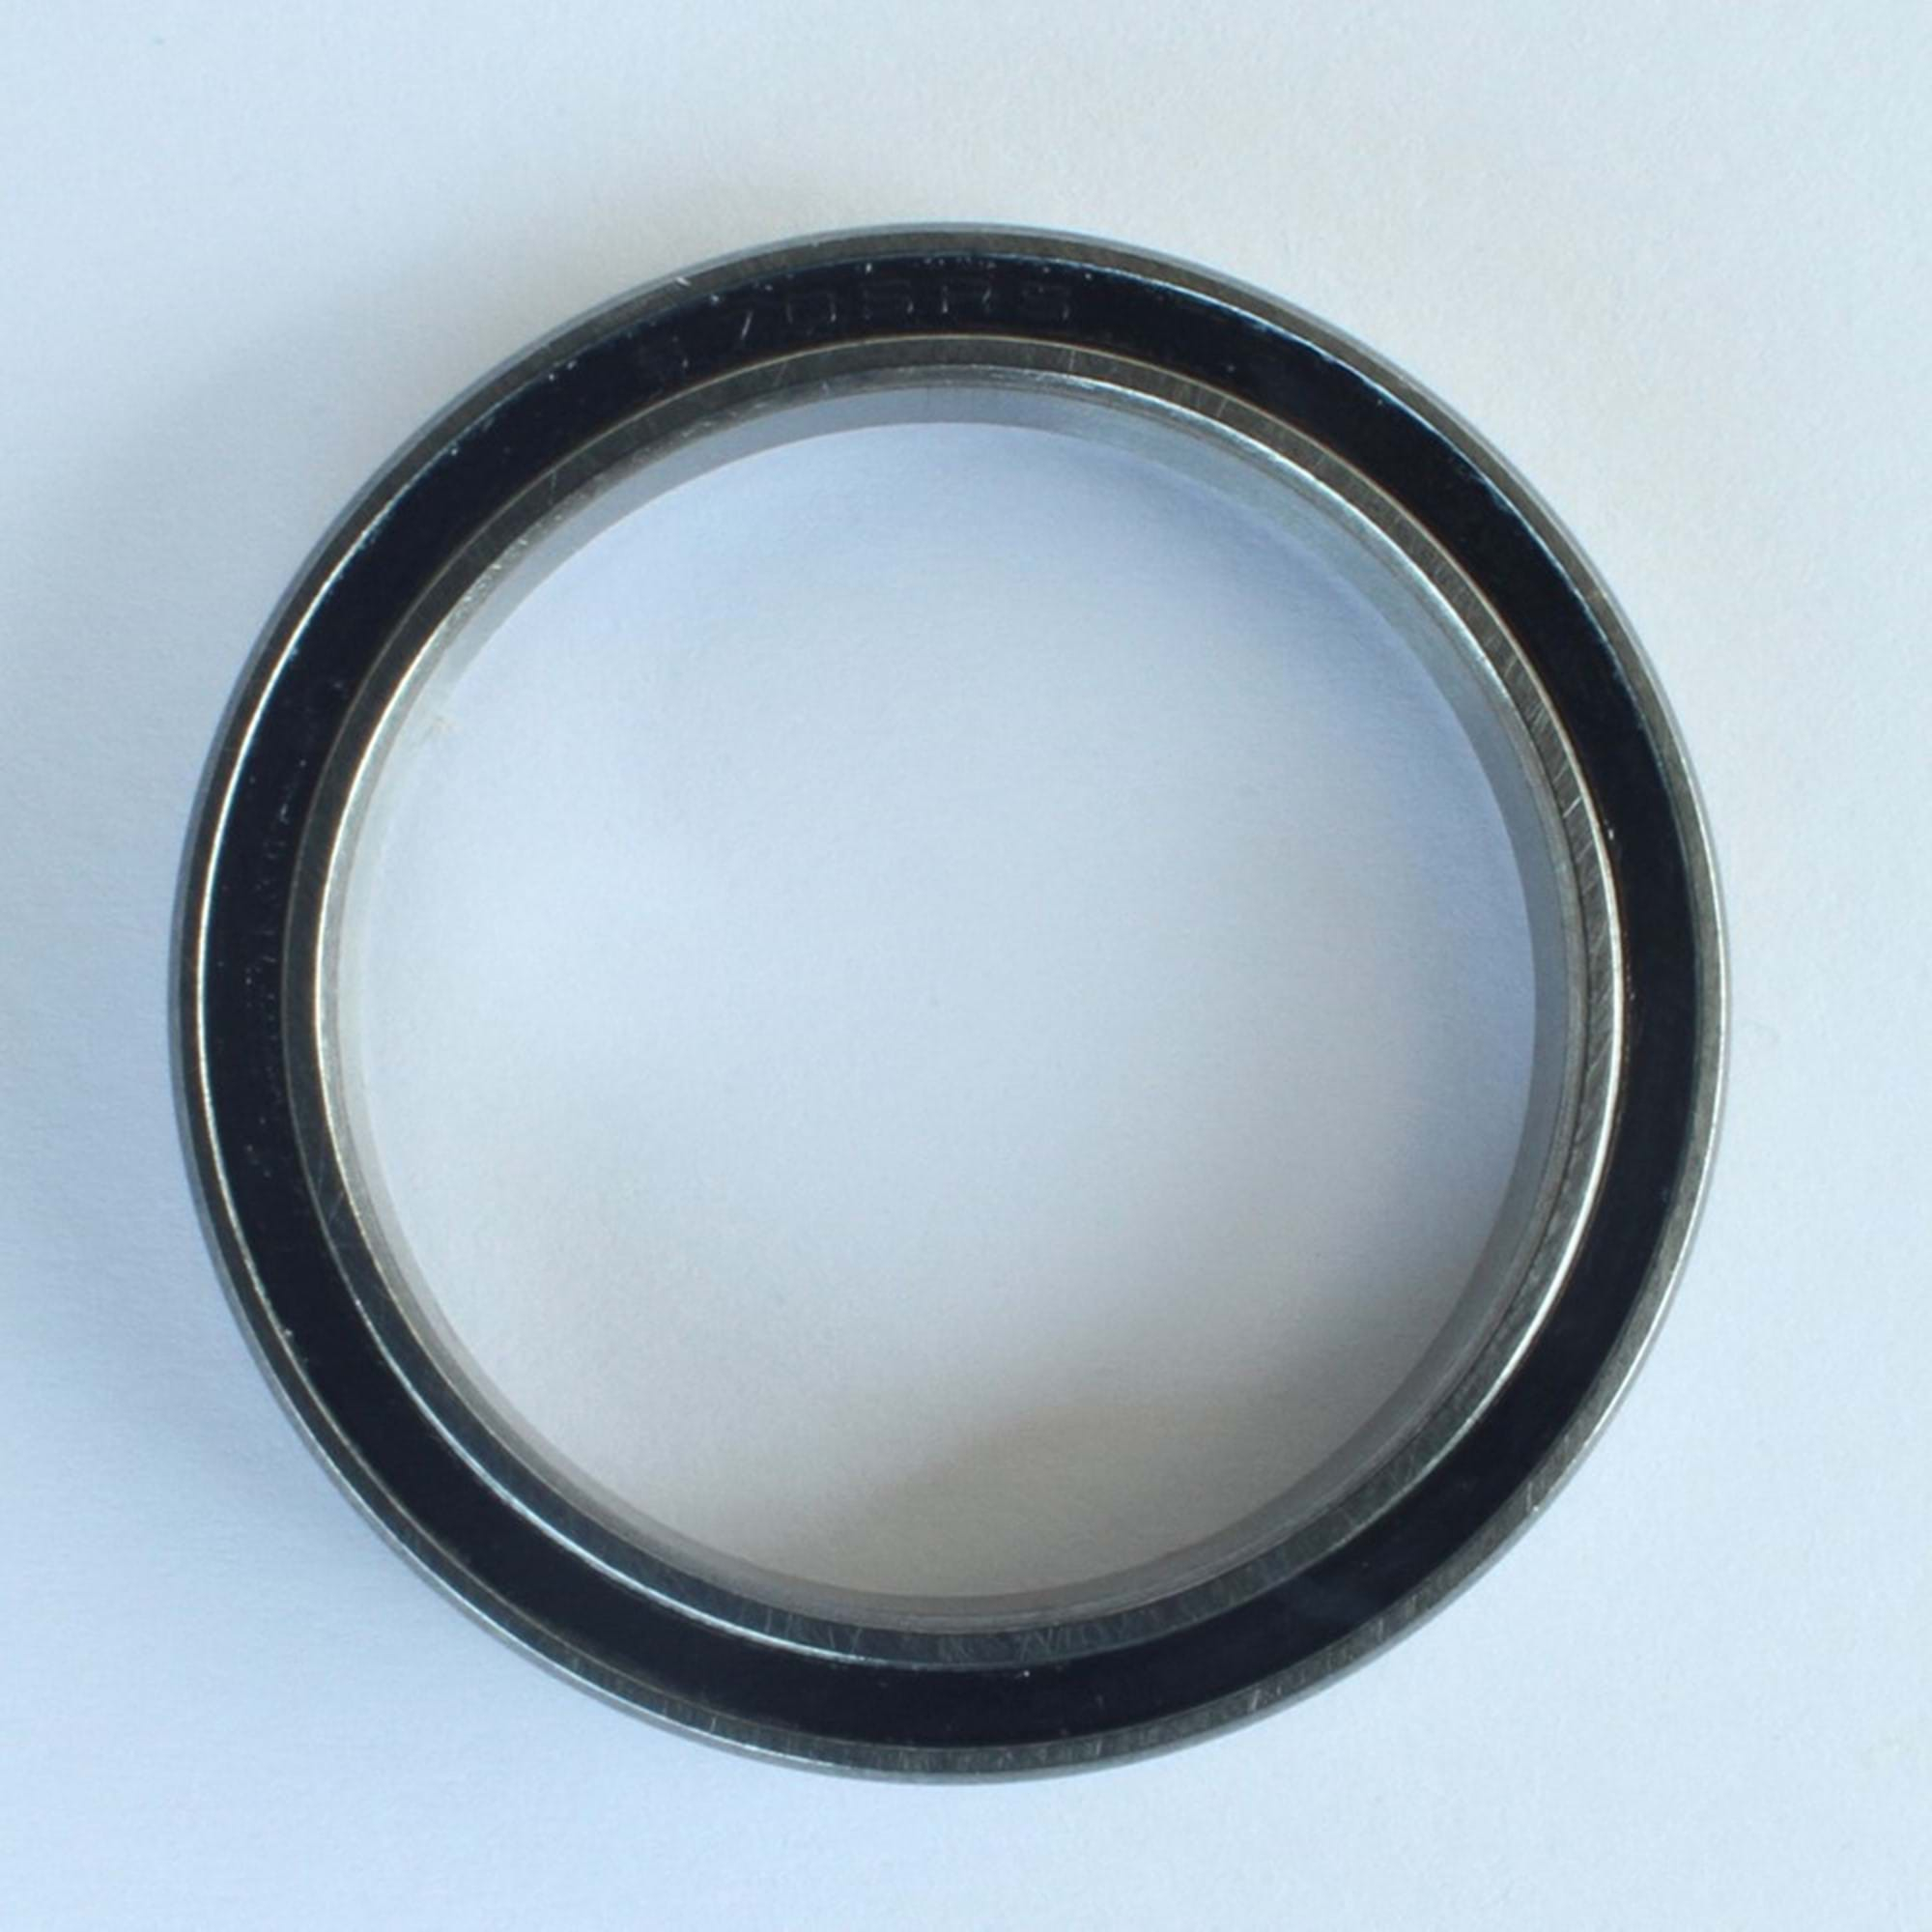 Kugleleje Enduro 6705-2RS ABEC3 LLB (32x25x4) - EB8017 | Bottom brackets bearings